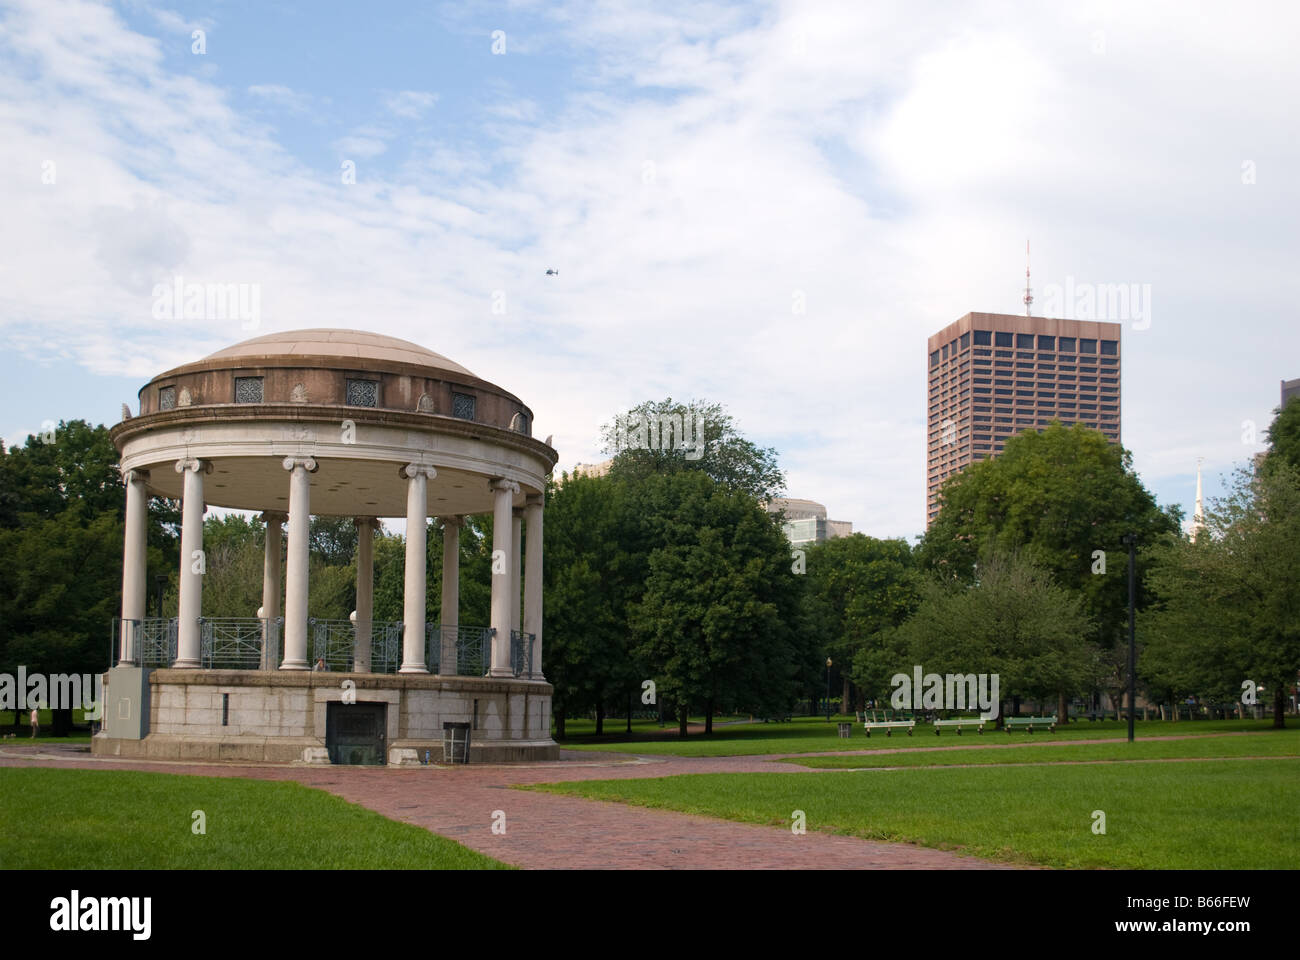 Summerhouse at the Boston Common - Stock Image